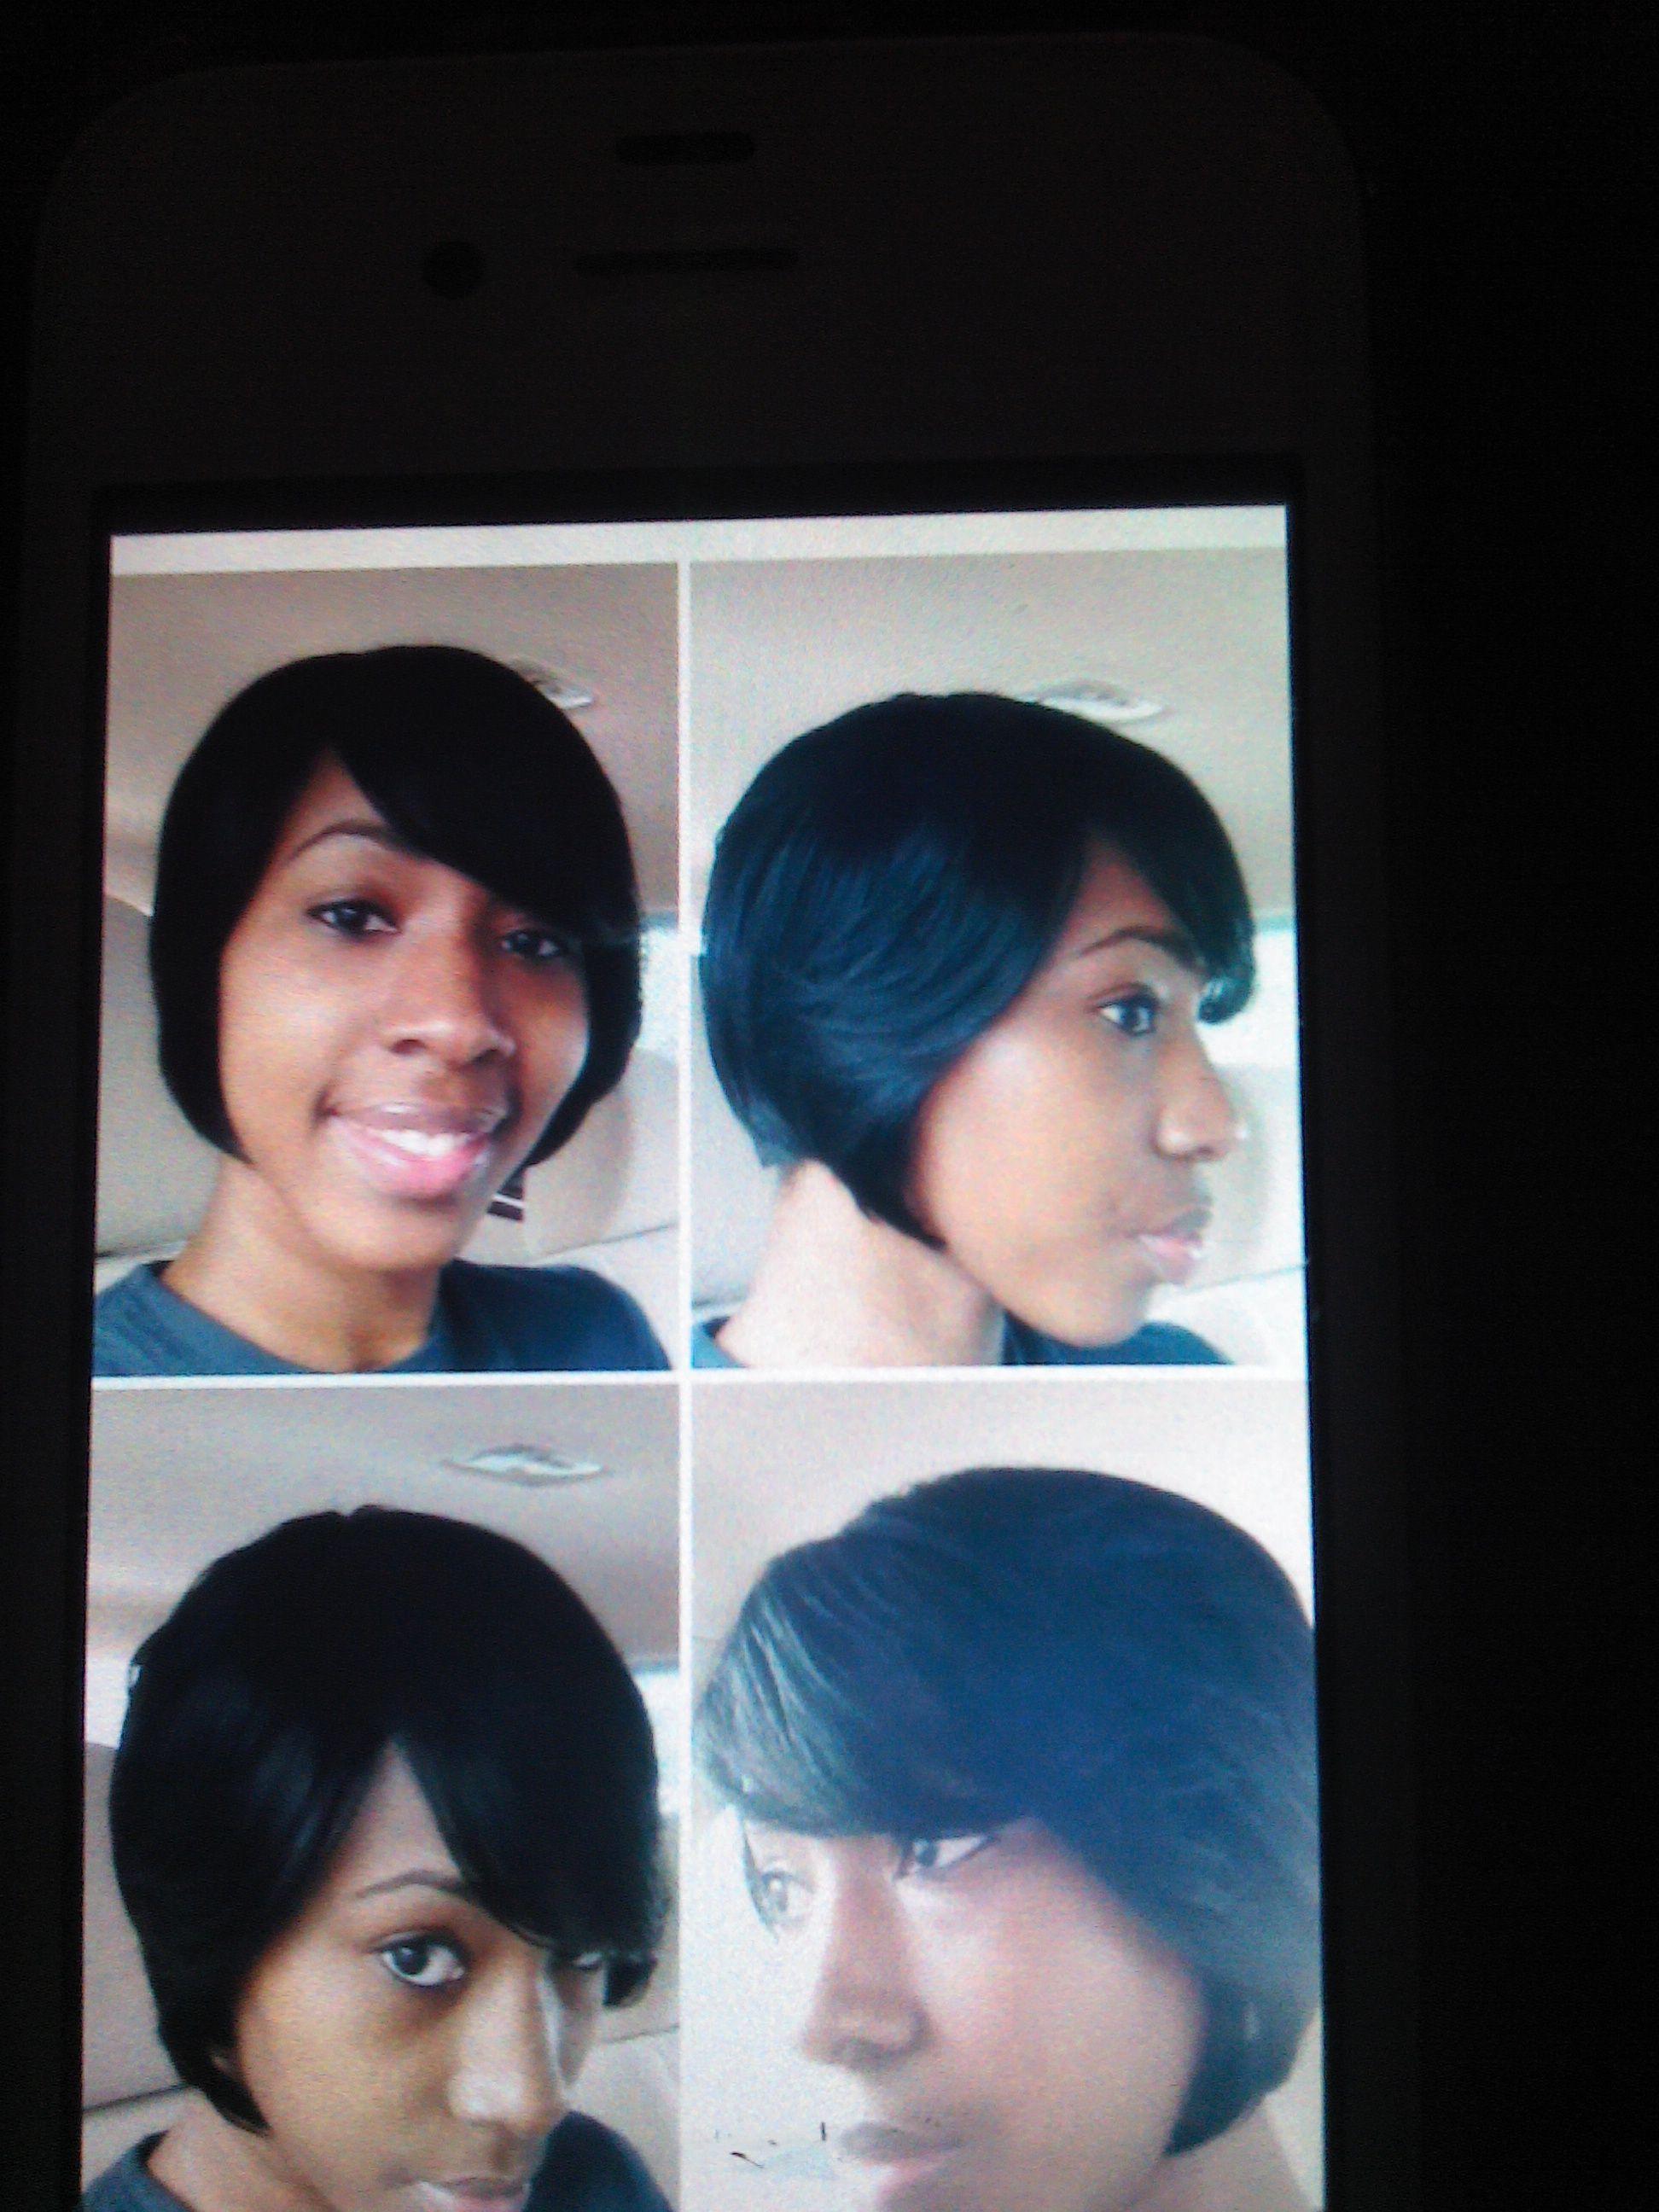 Sensationnel Human Hair Premium Now Bump Wig Vogue Crop ...